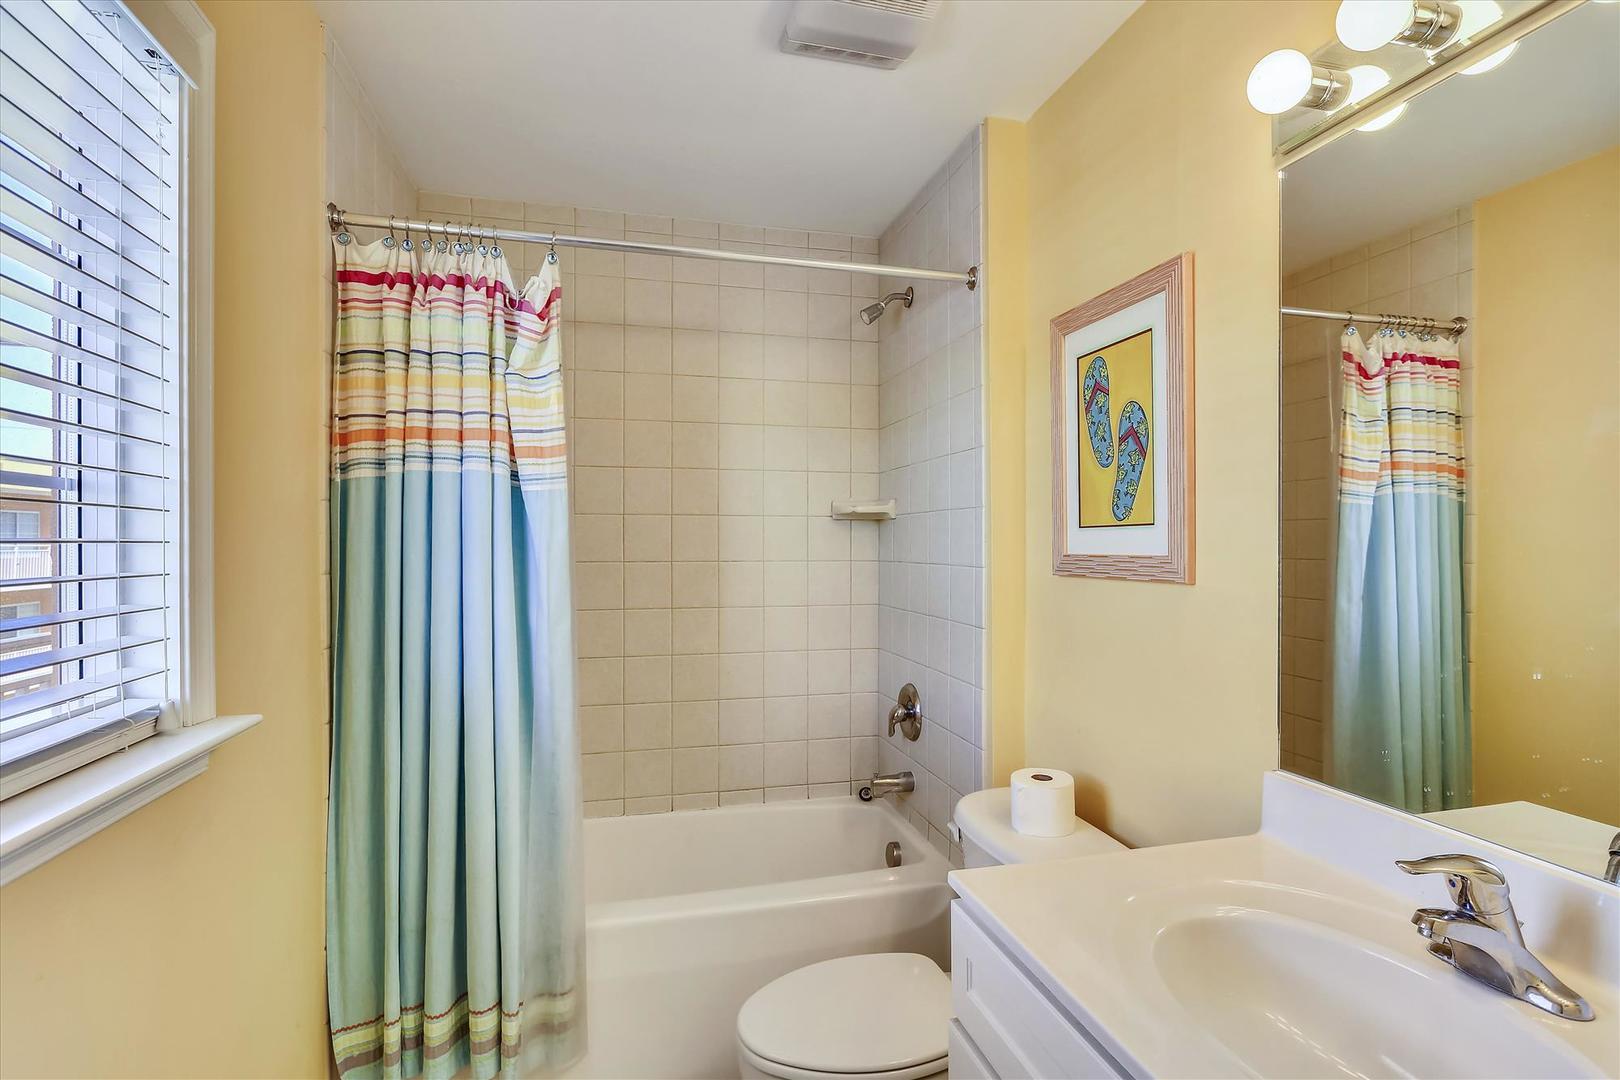 Sunset Bay II 518 - Bathroom 2